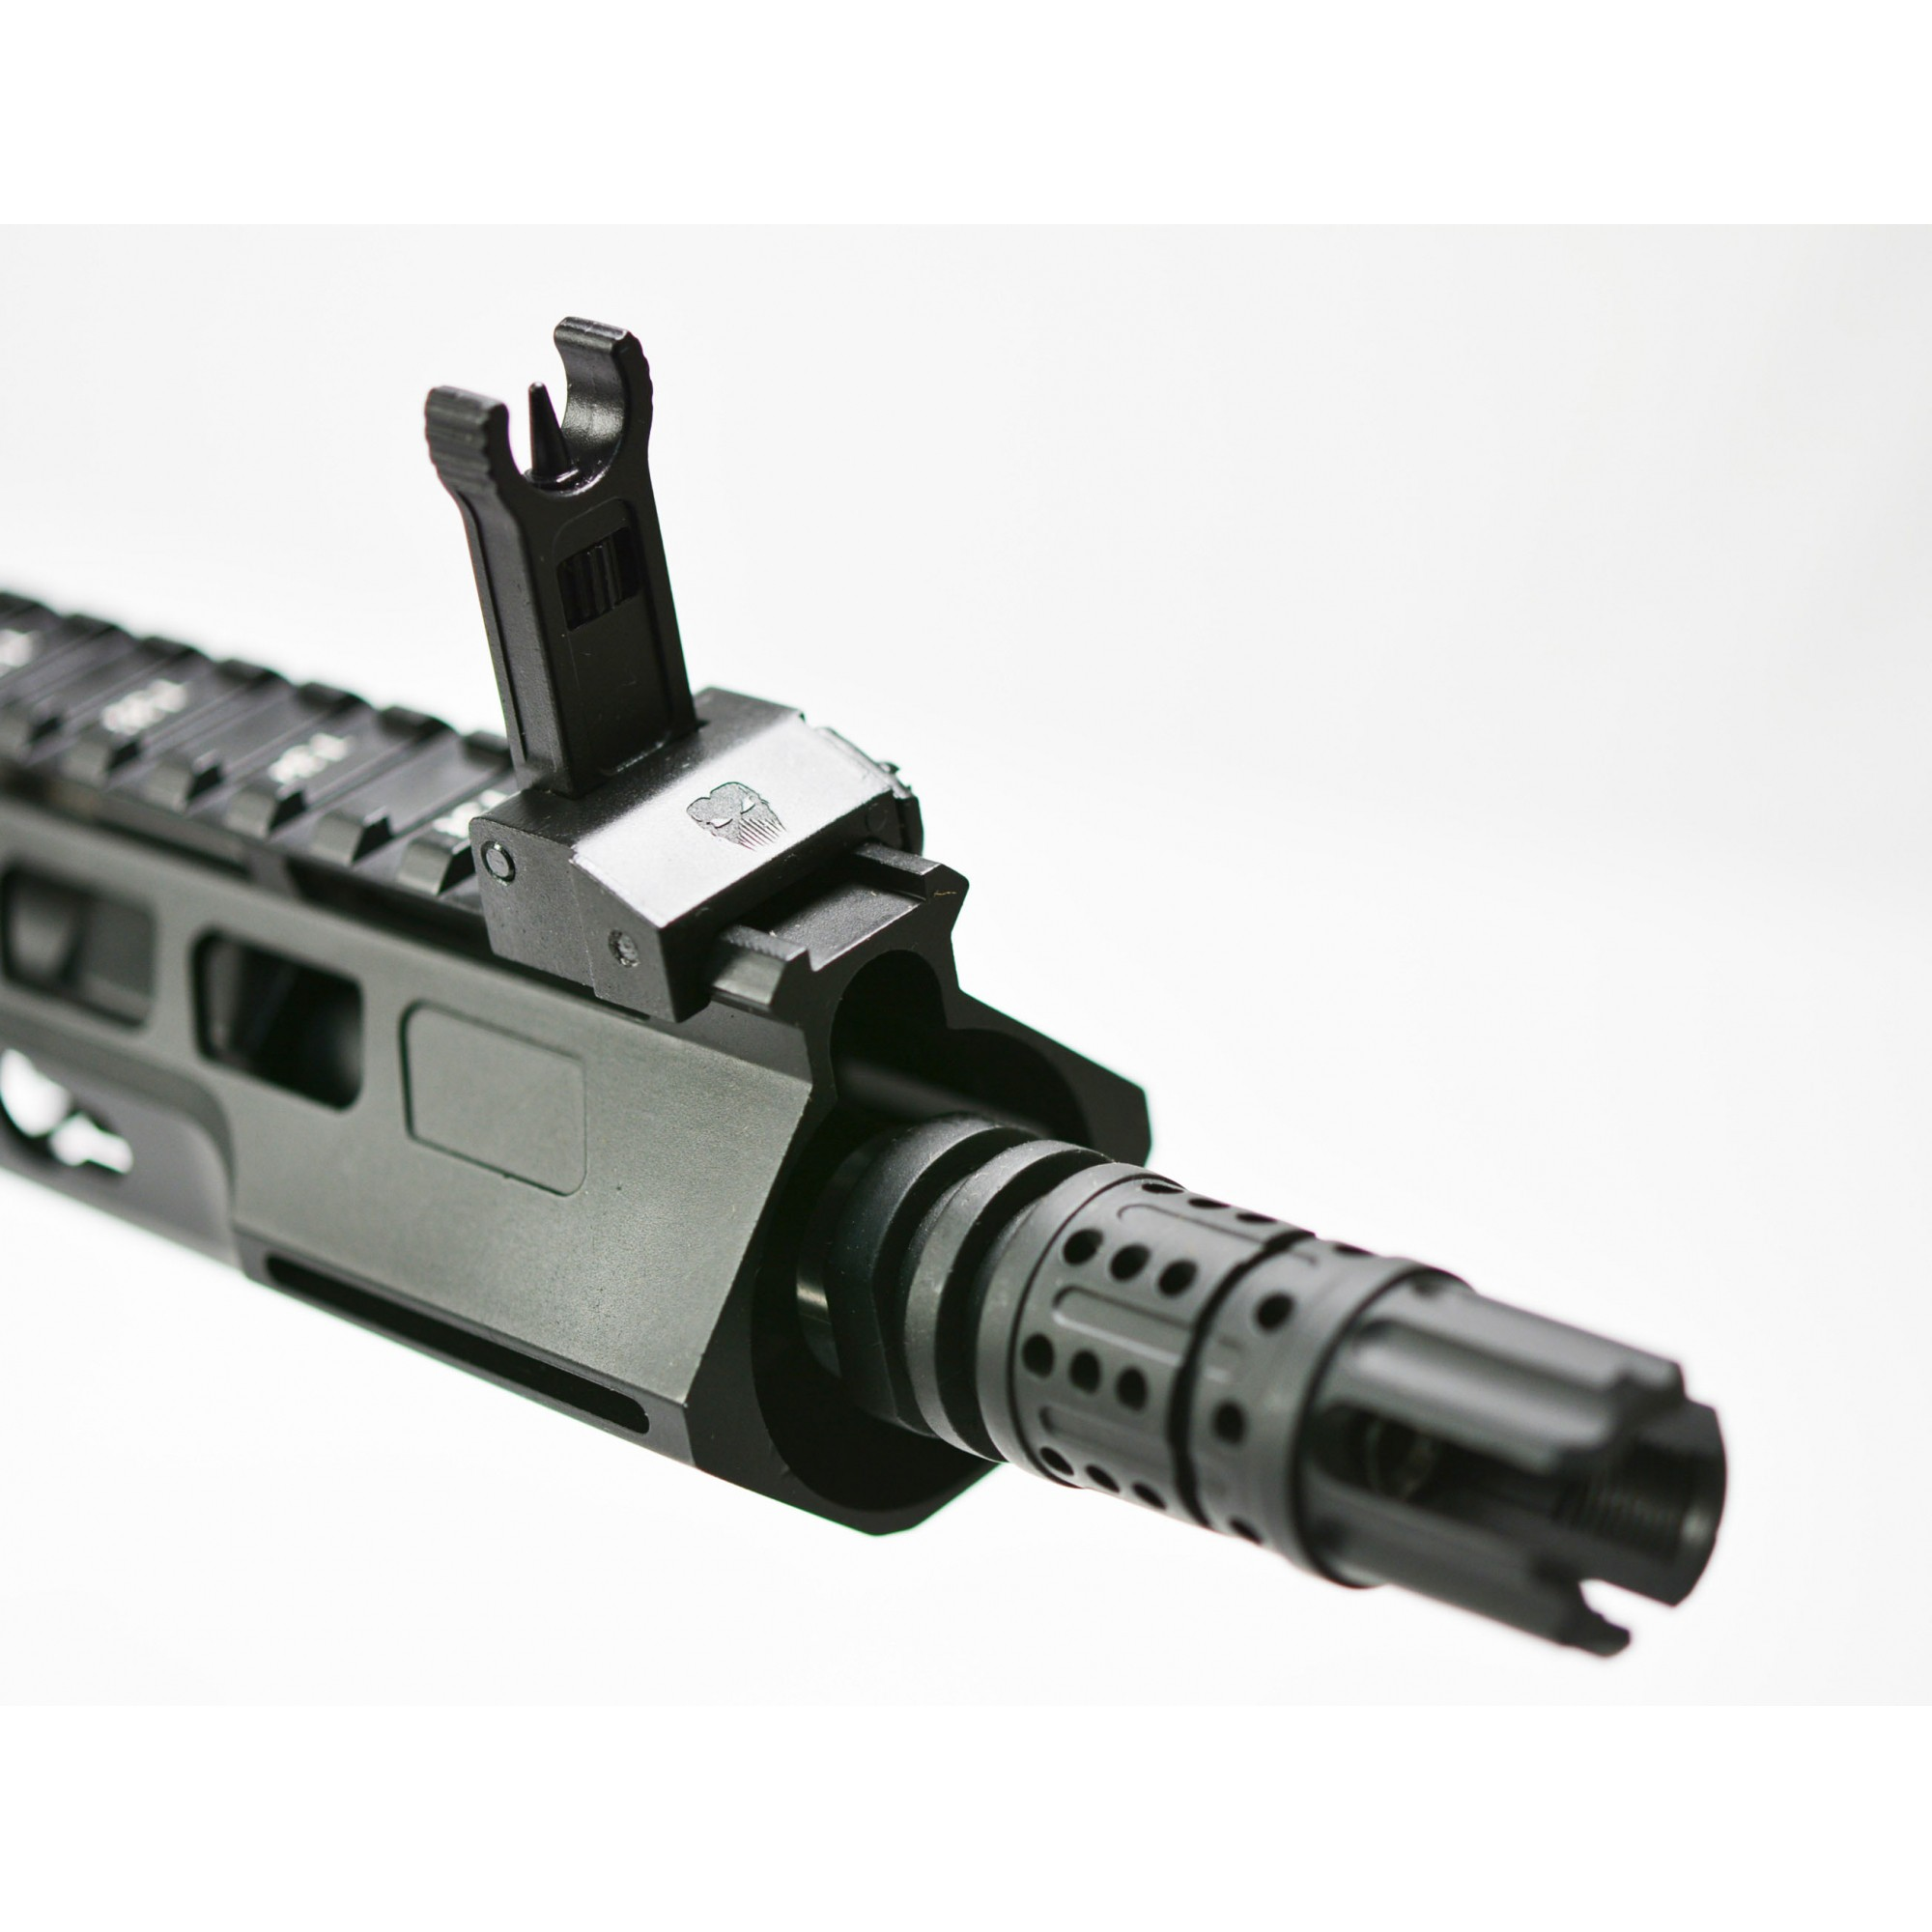 RIFLE DE AIRSOFT AEG M4 PHANTOM EXTREMIS RIFLES BLACK FULL METAL BLOWBACK PER701 MKI - APS